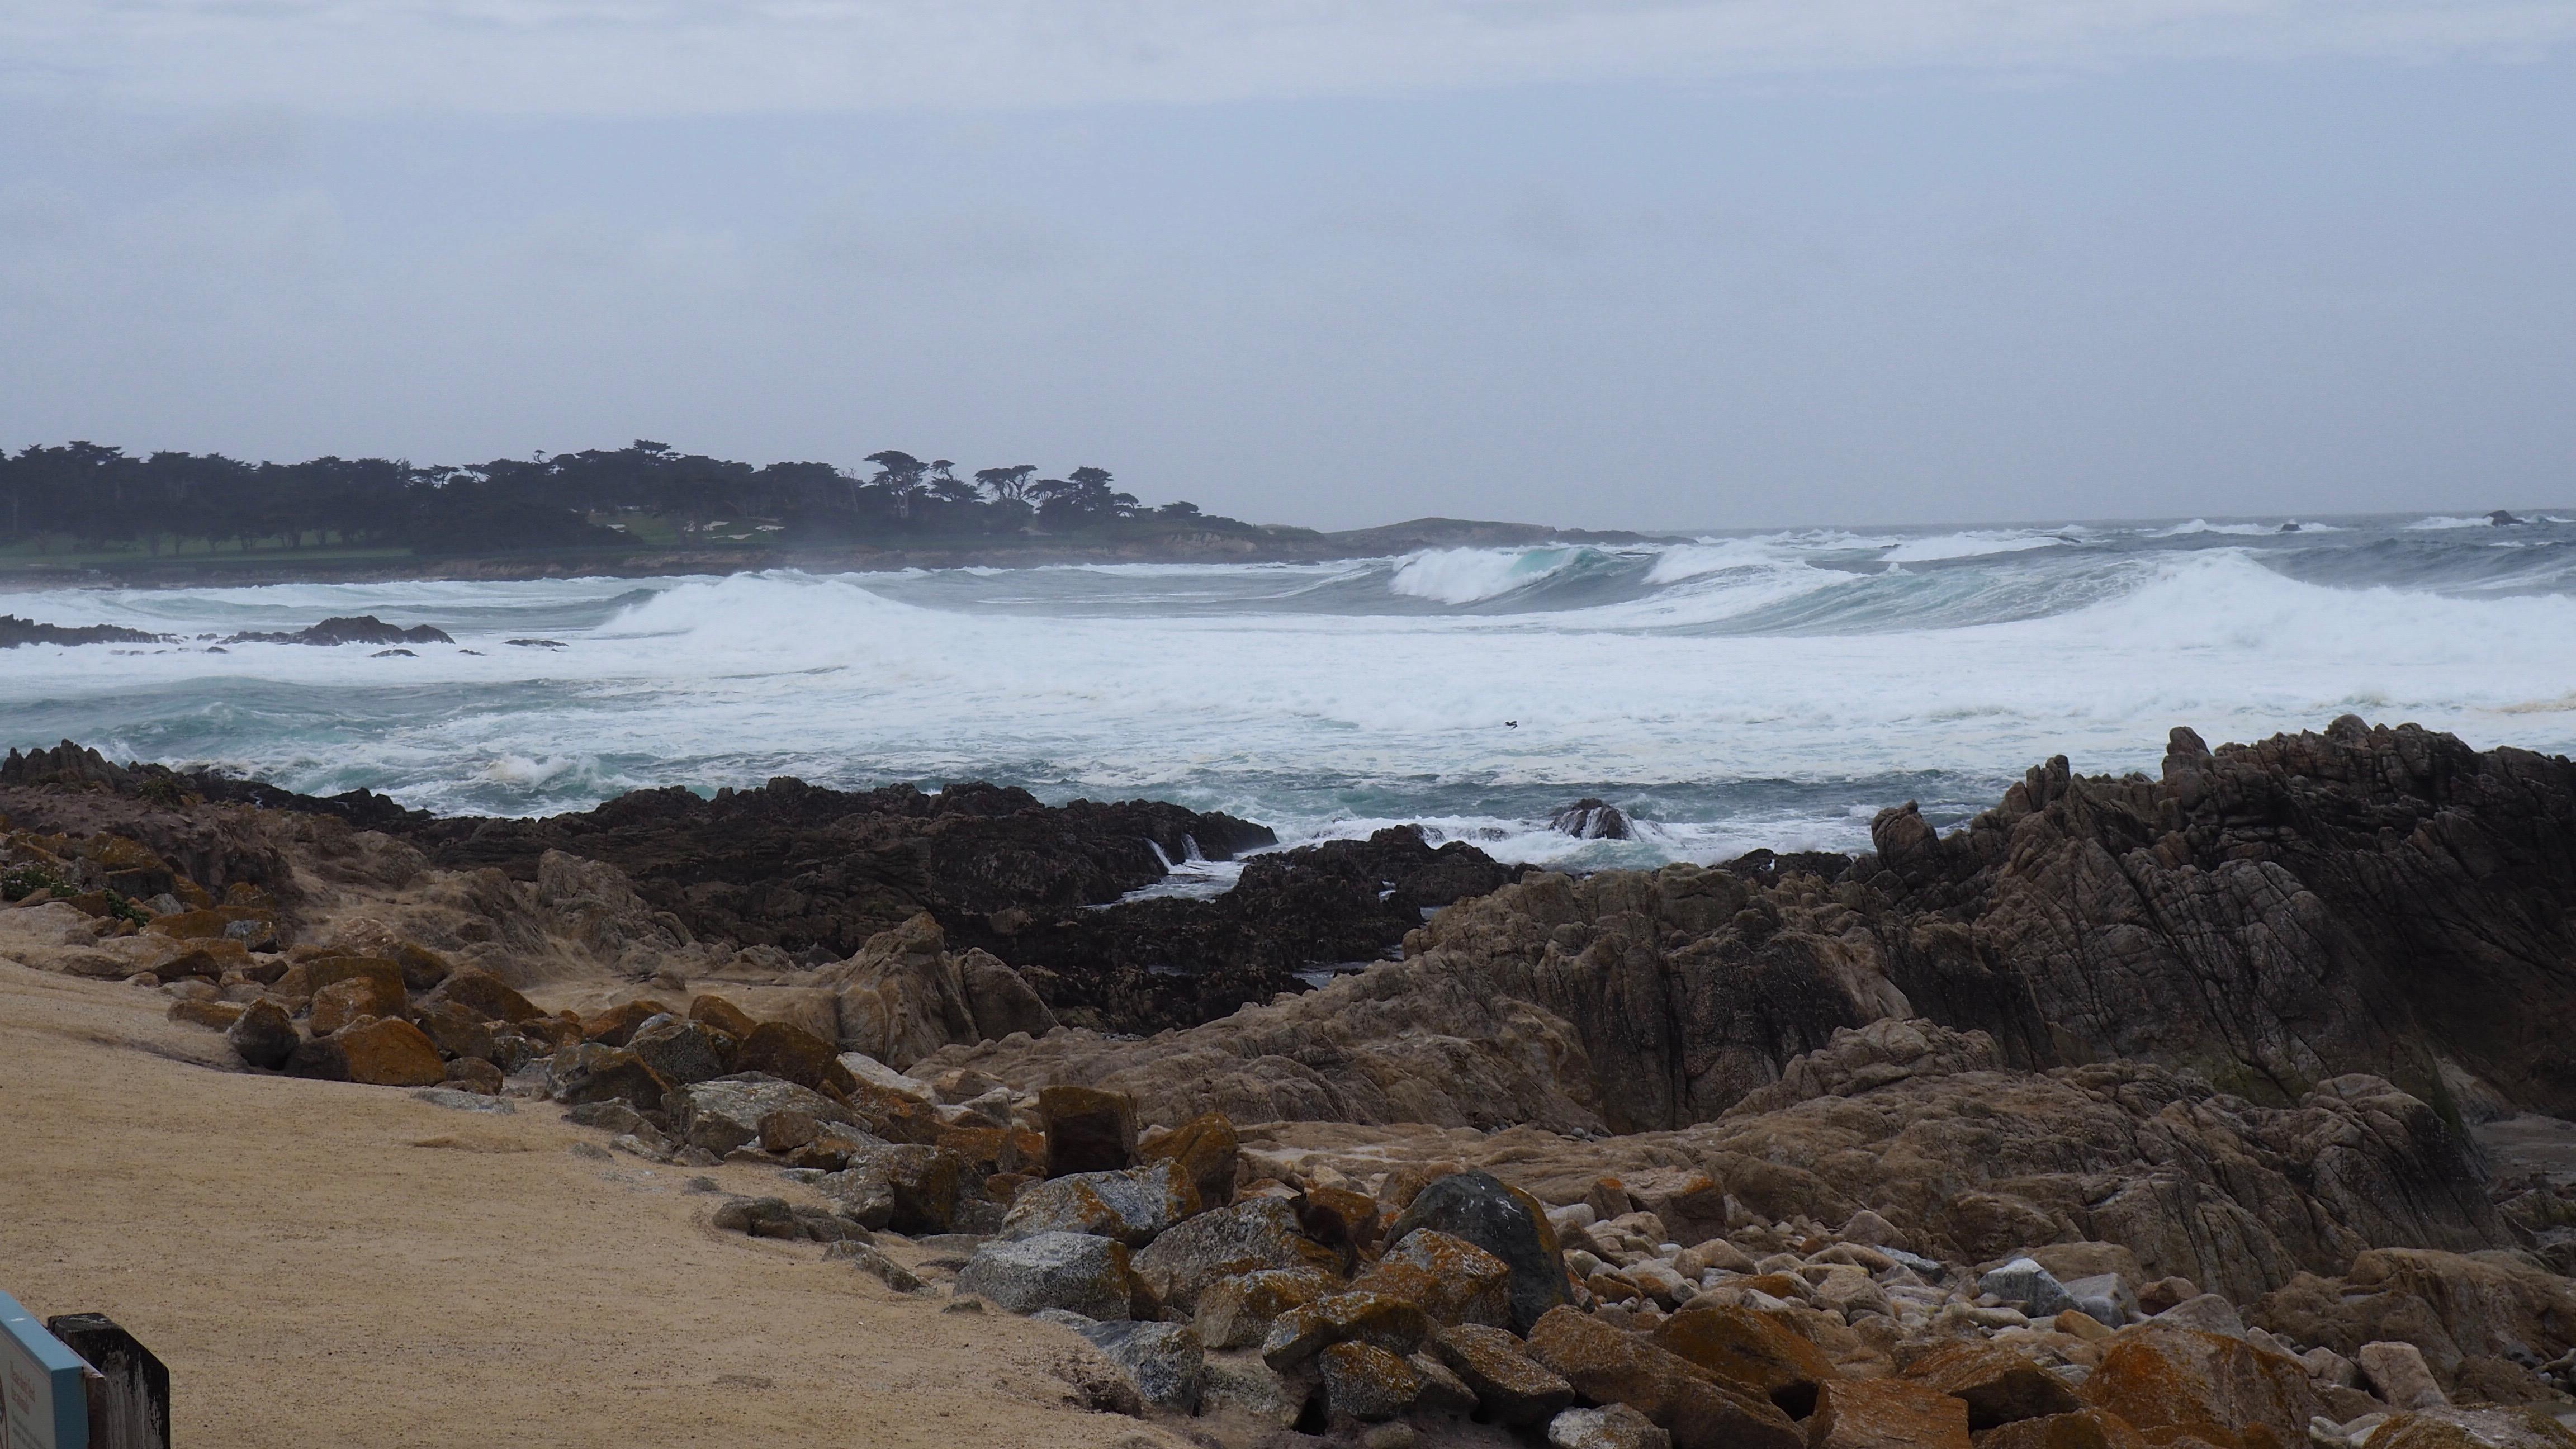 Coastline along the 17 mile drive.